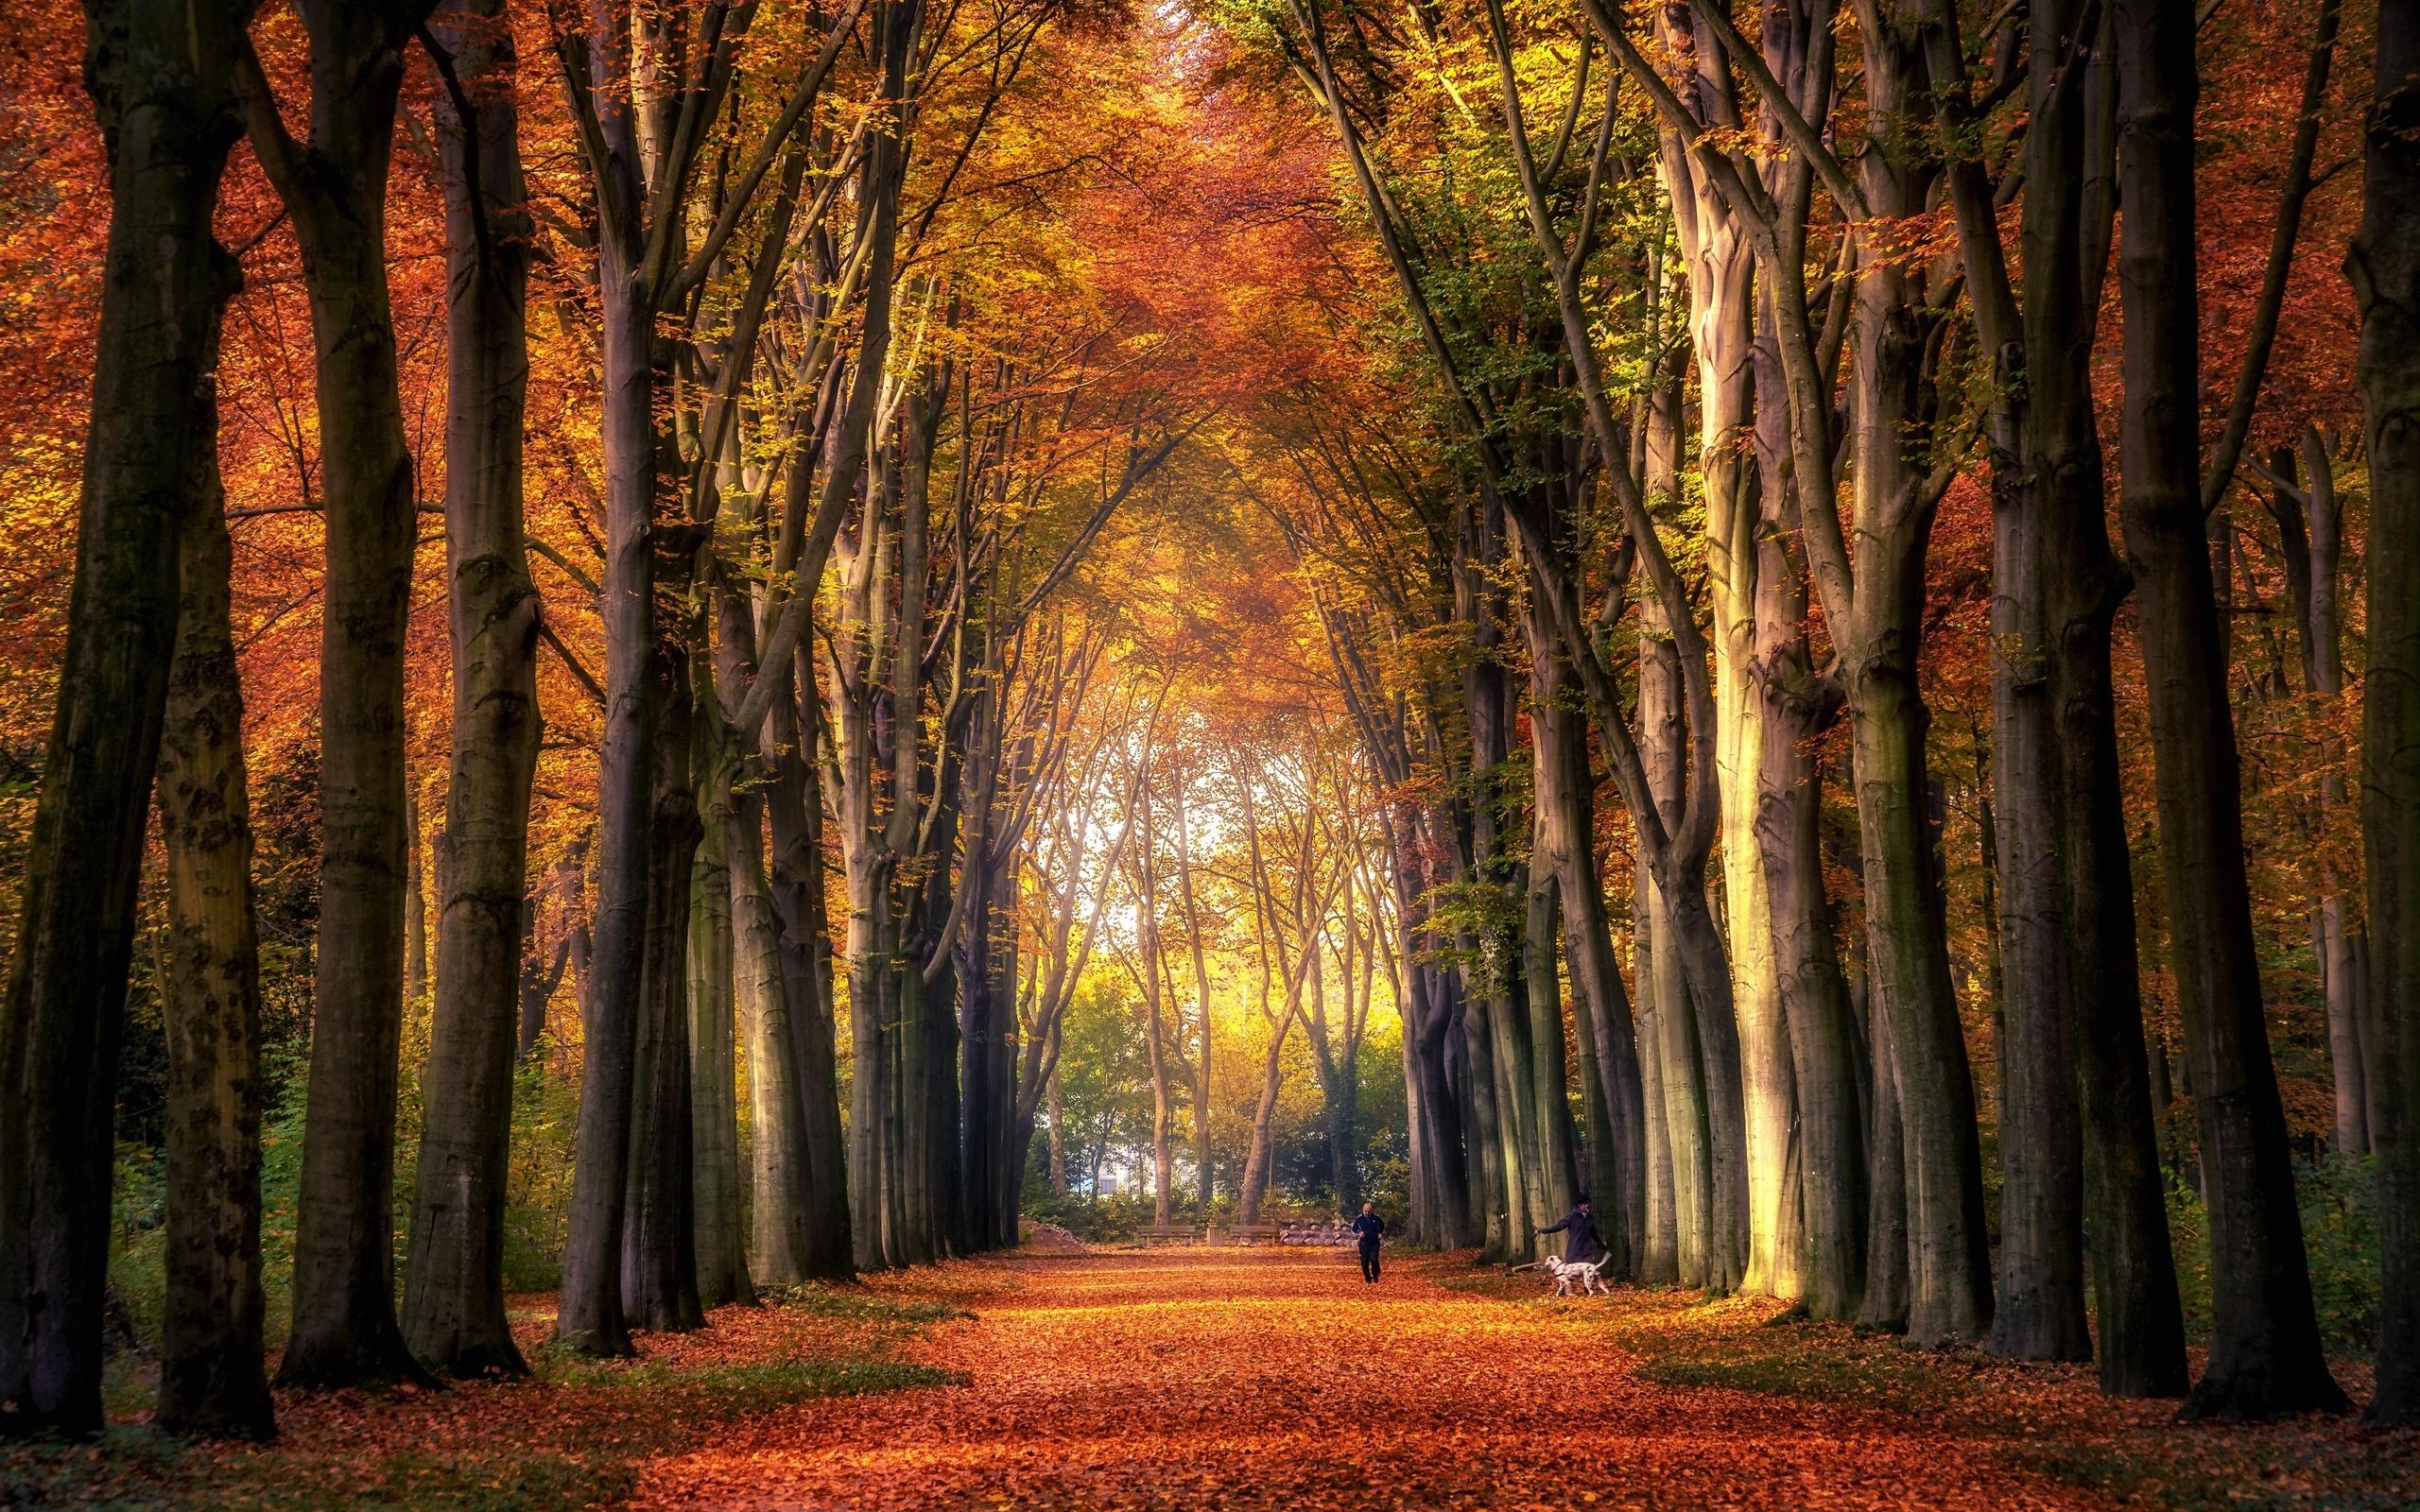 парк, аллея, собака, осень